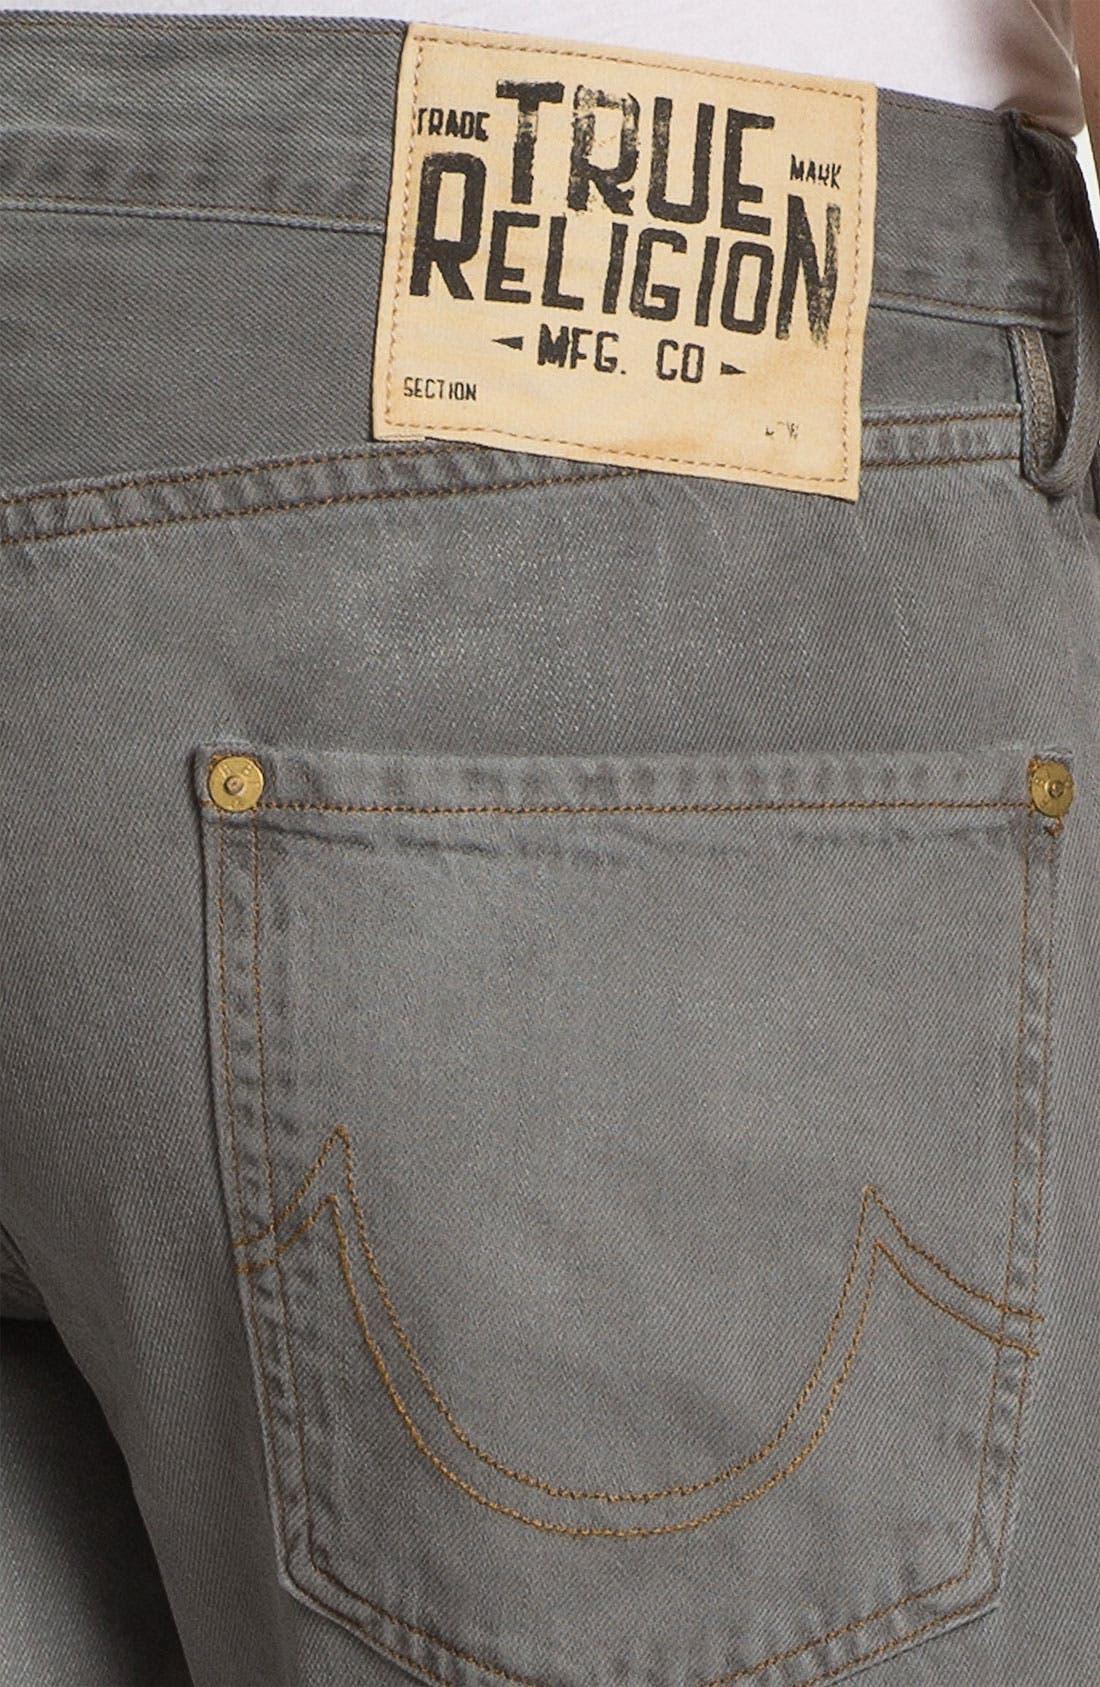 Alternate Image 4  - True Religion Brand Jeans 'Geno Blue Collar Crossroads' Slim Straight Leg Jeans (Smoke Stack)